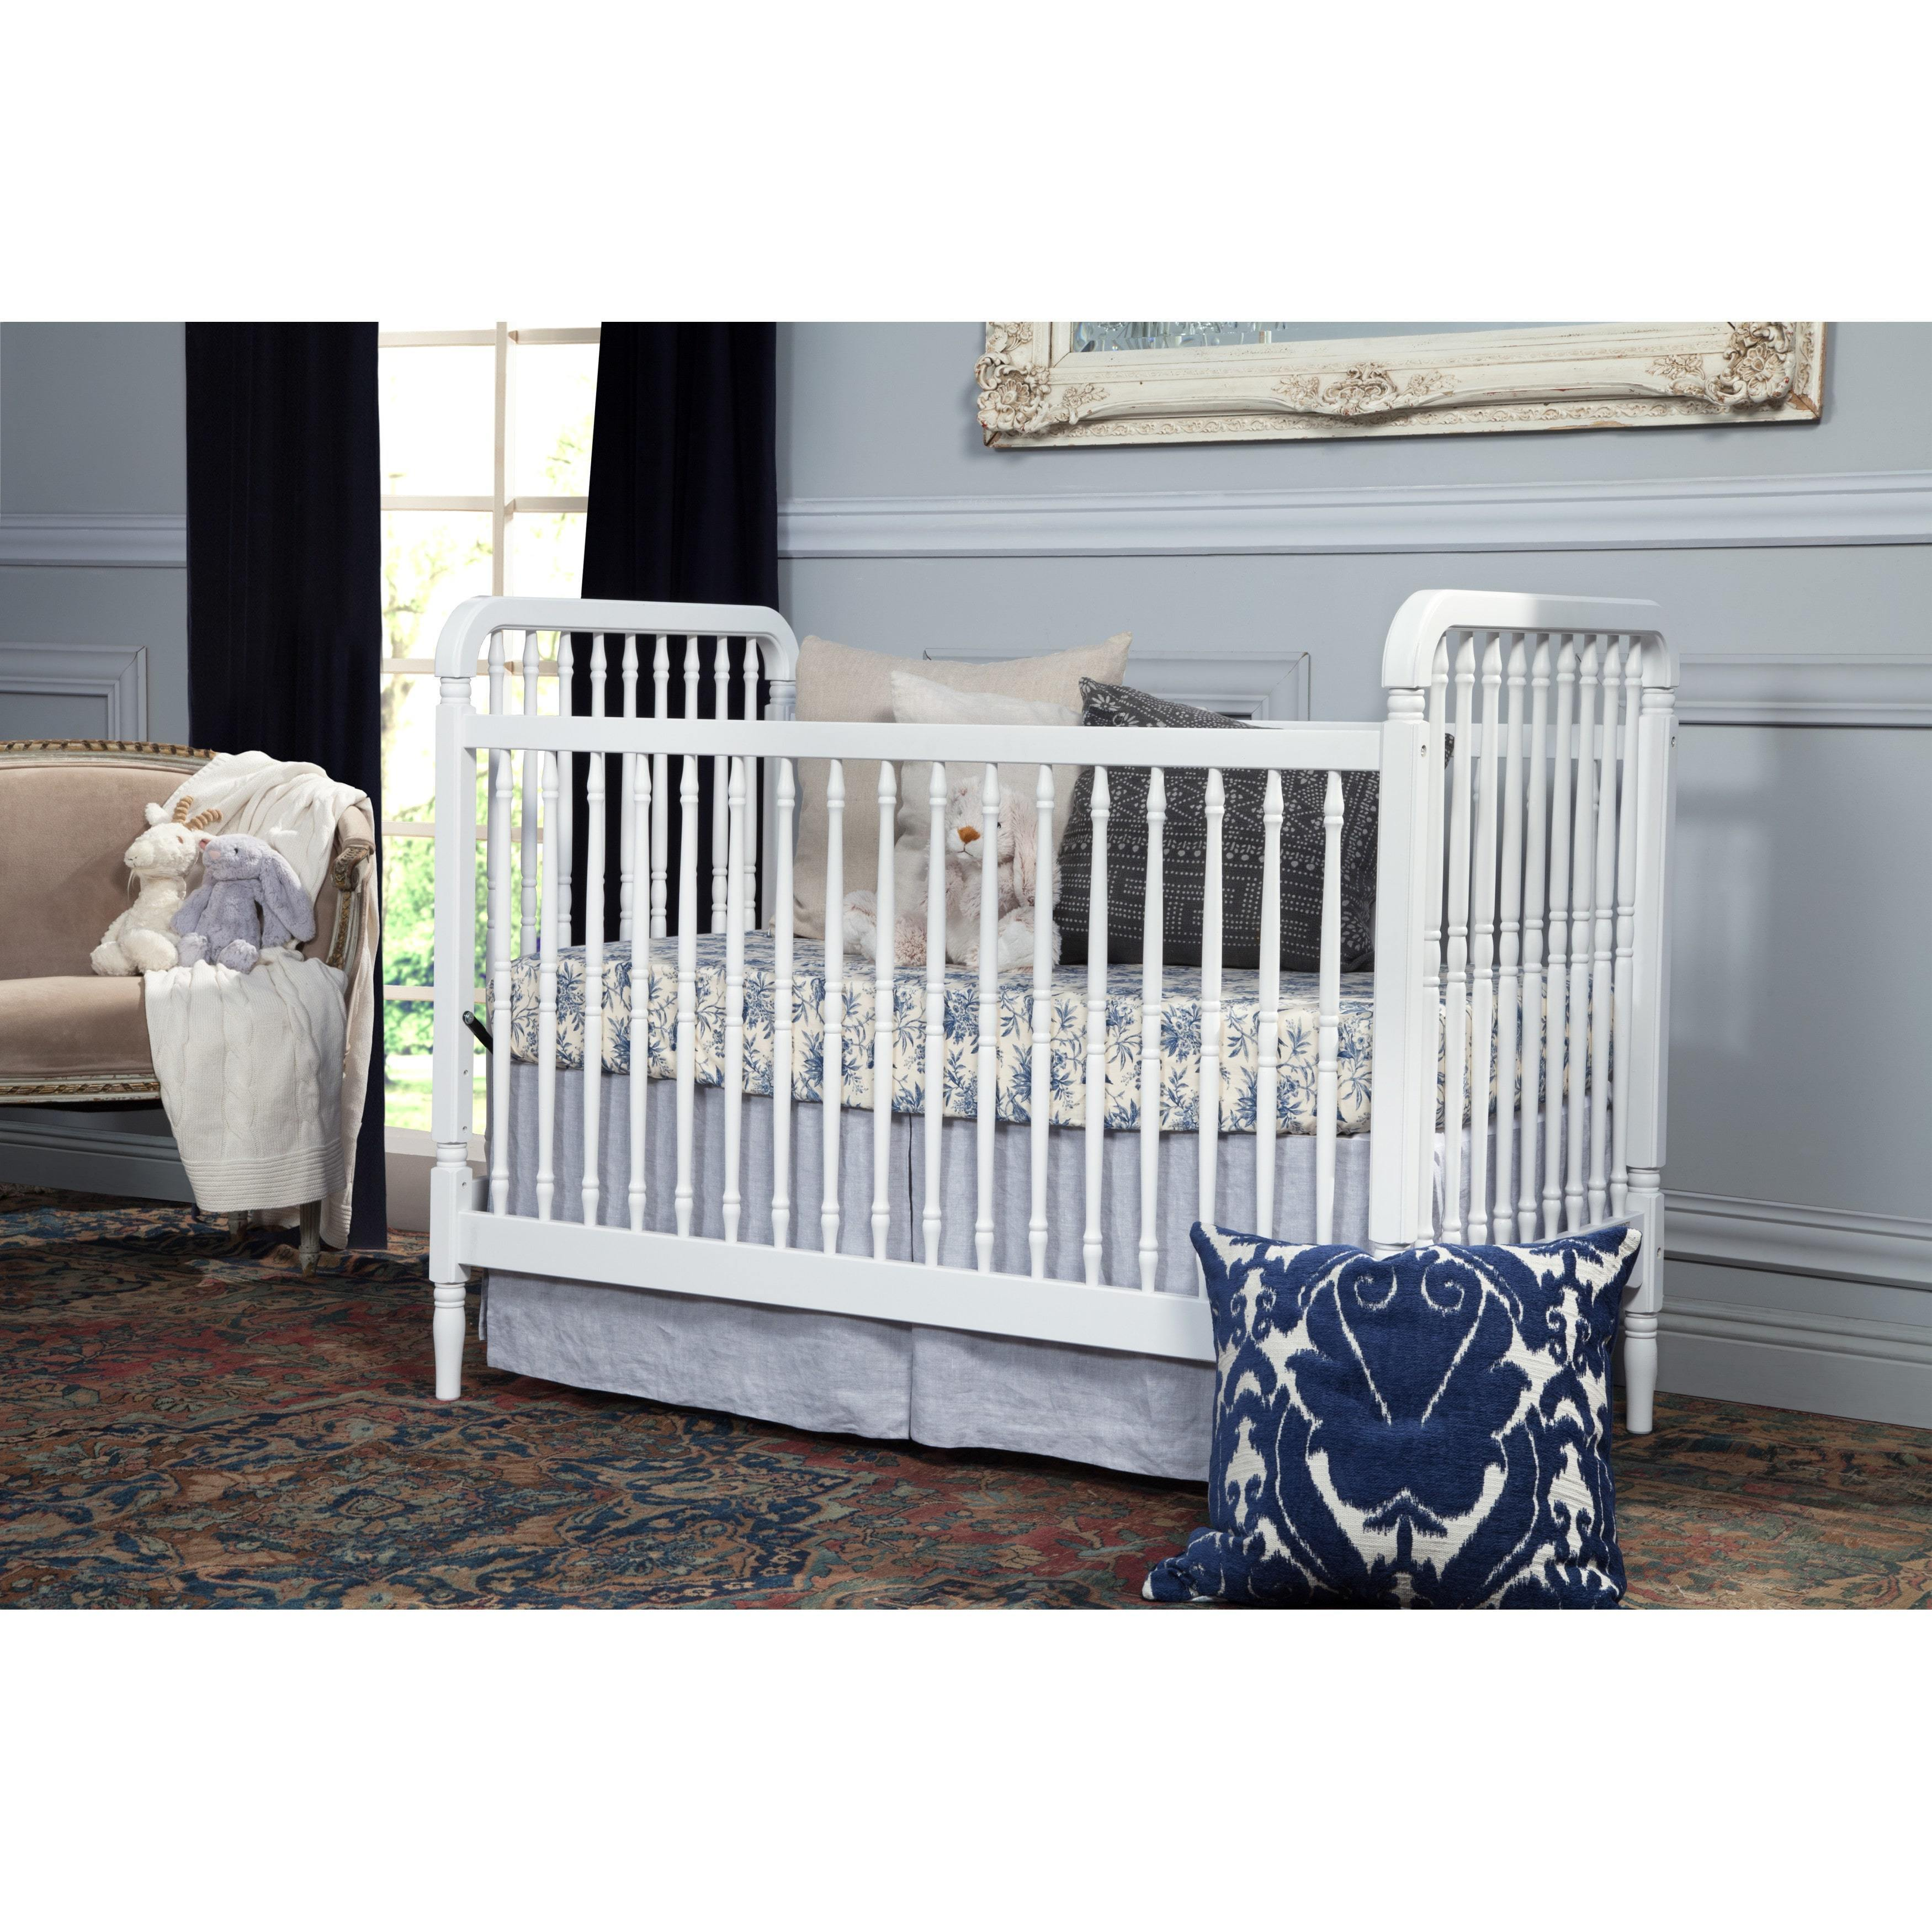 Million Dollar Baby Liberty 3-in-1 Convertible Crib (Whit...